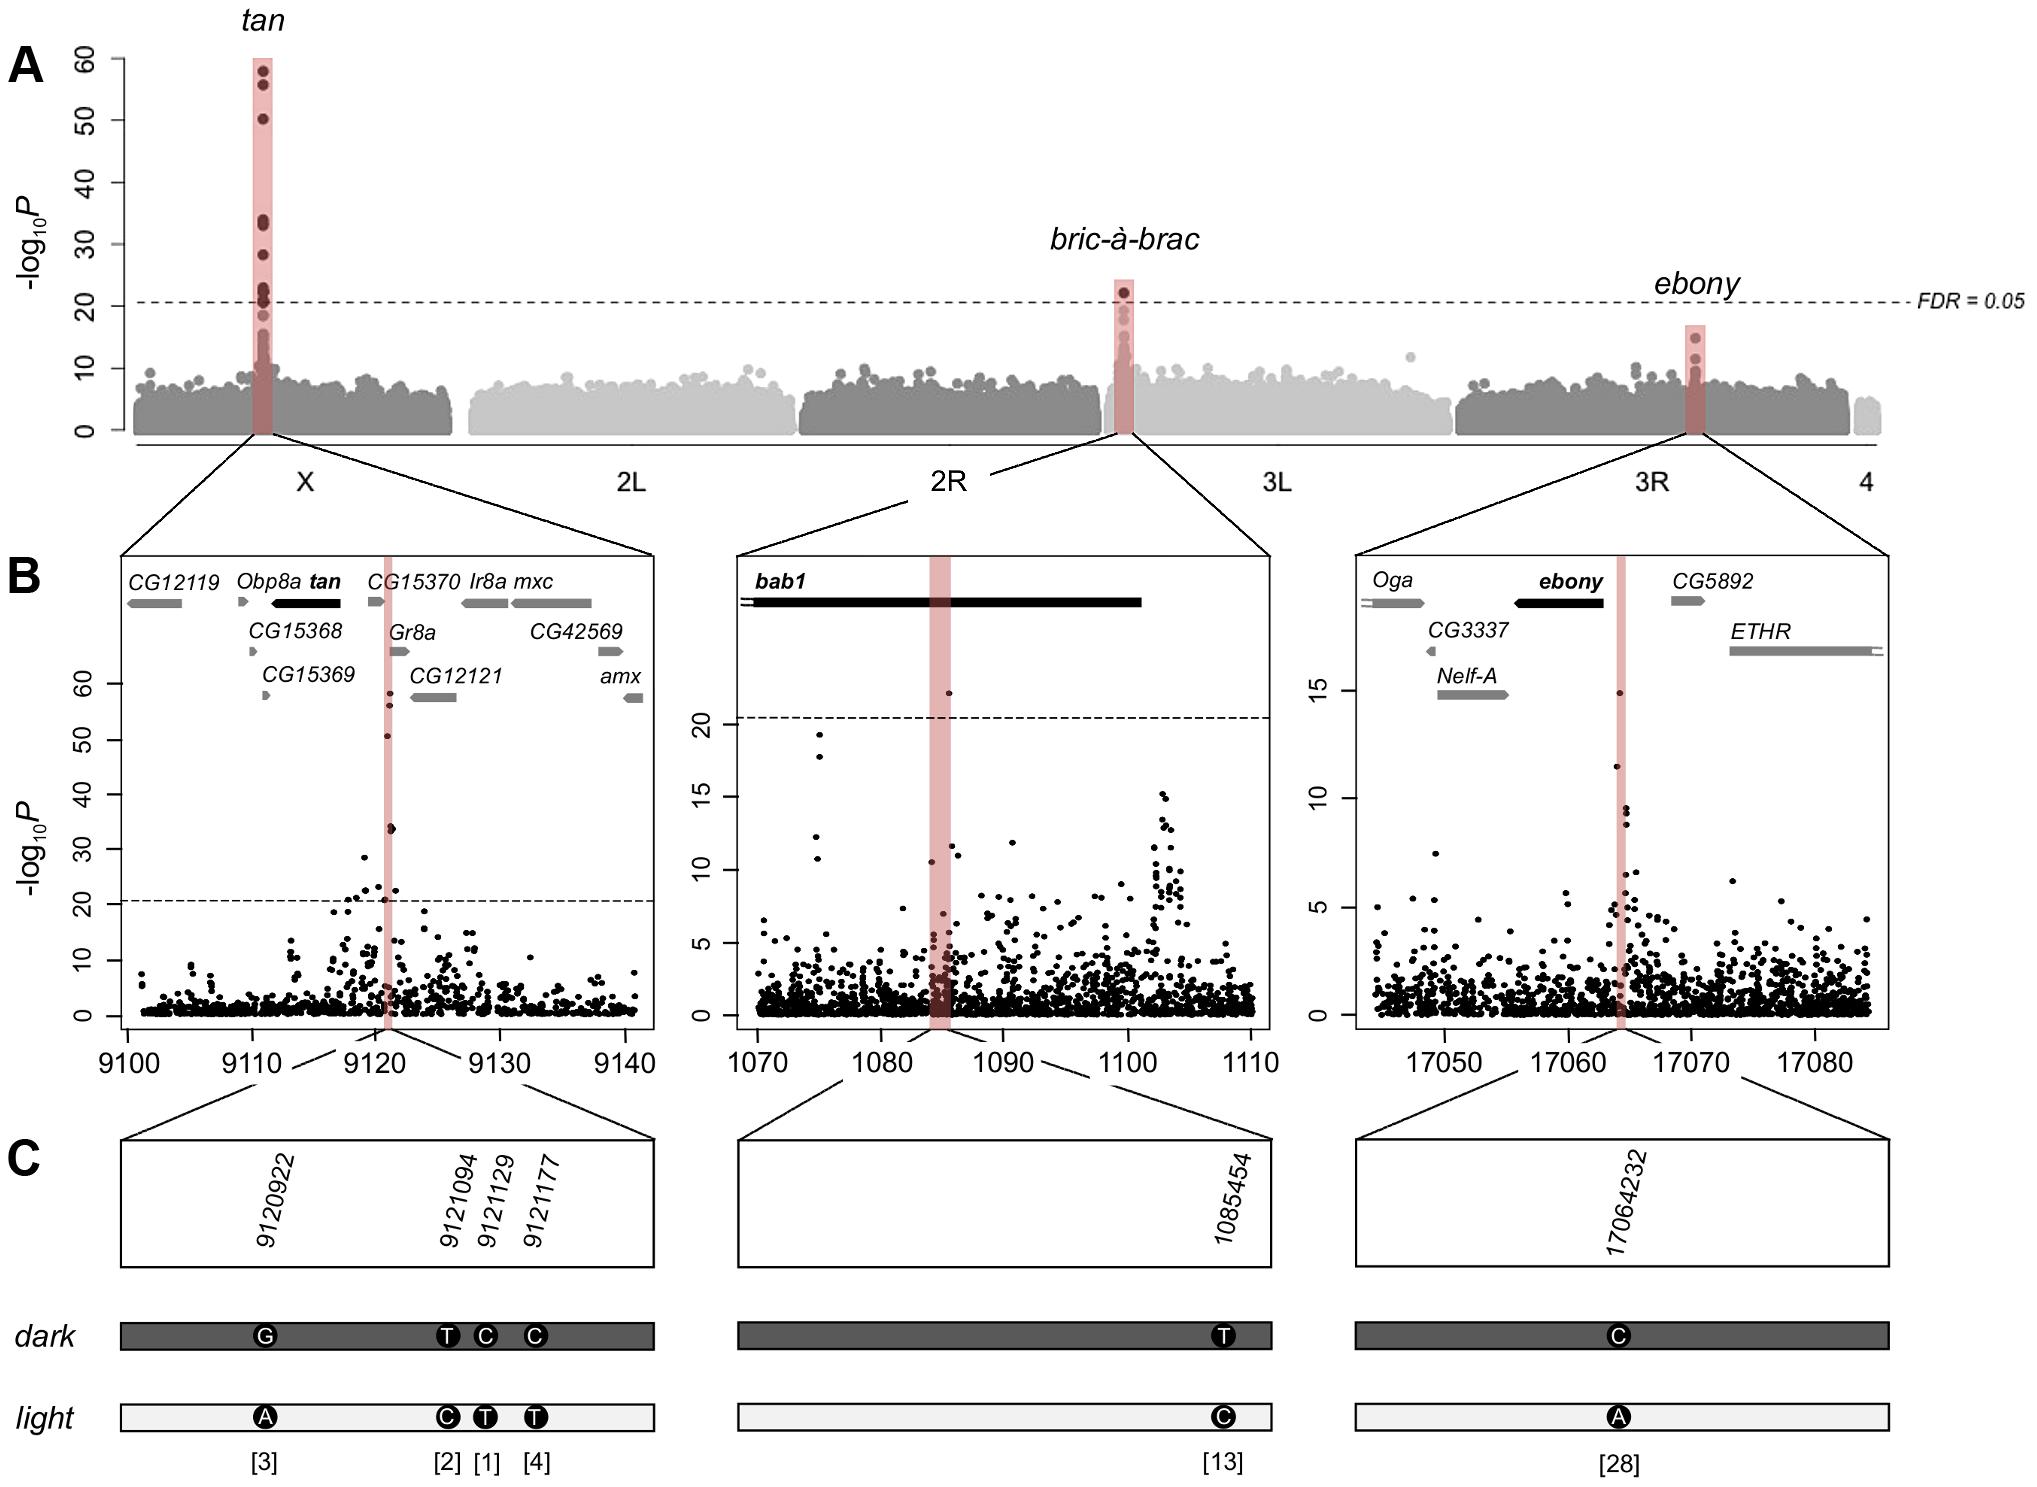 Genome-wide association study of female abdominal pigmentation.